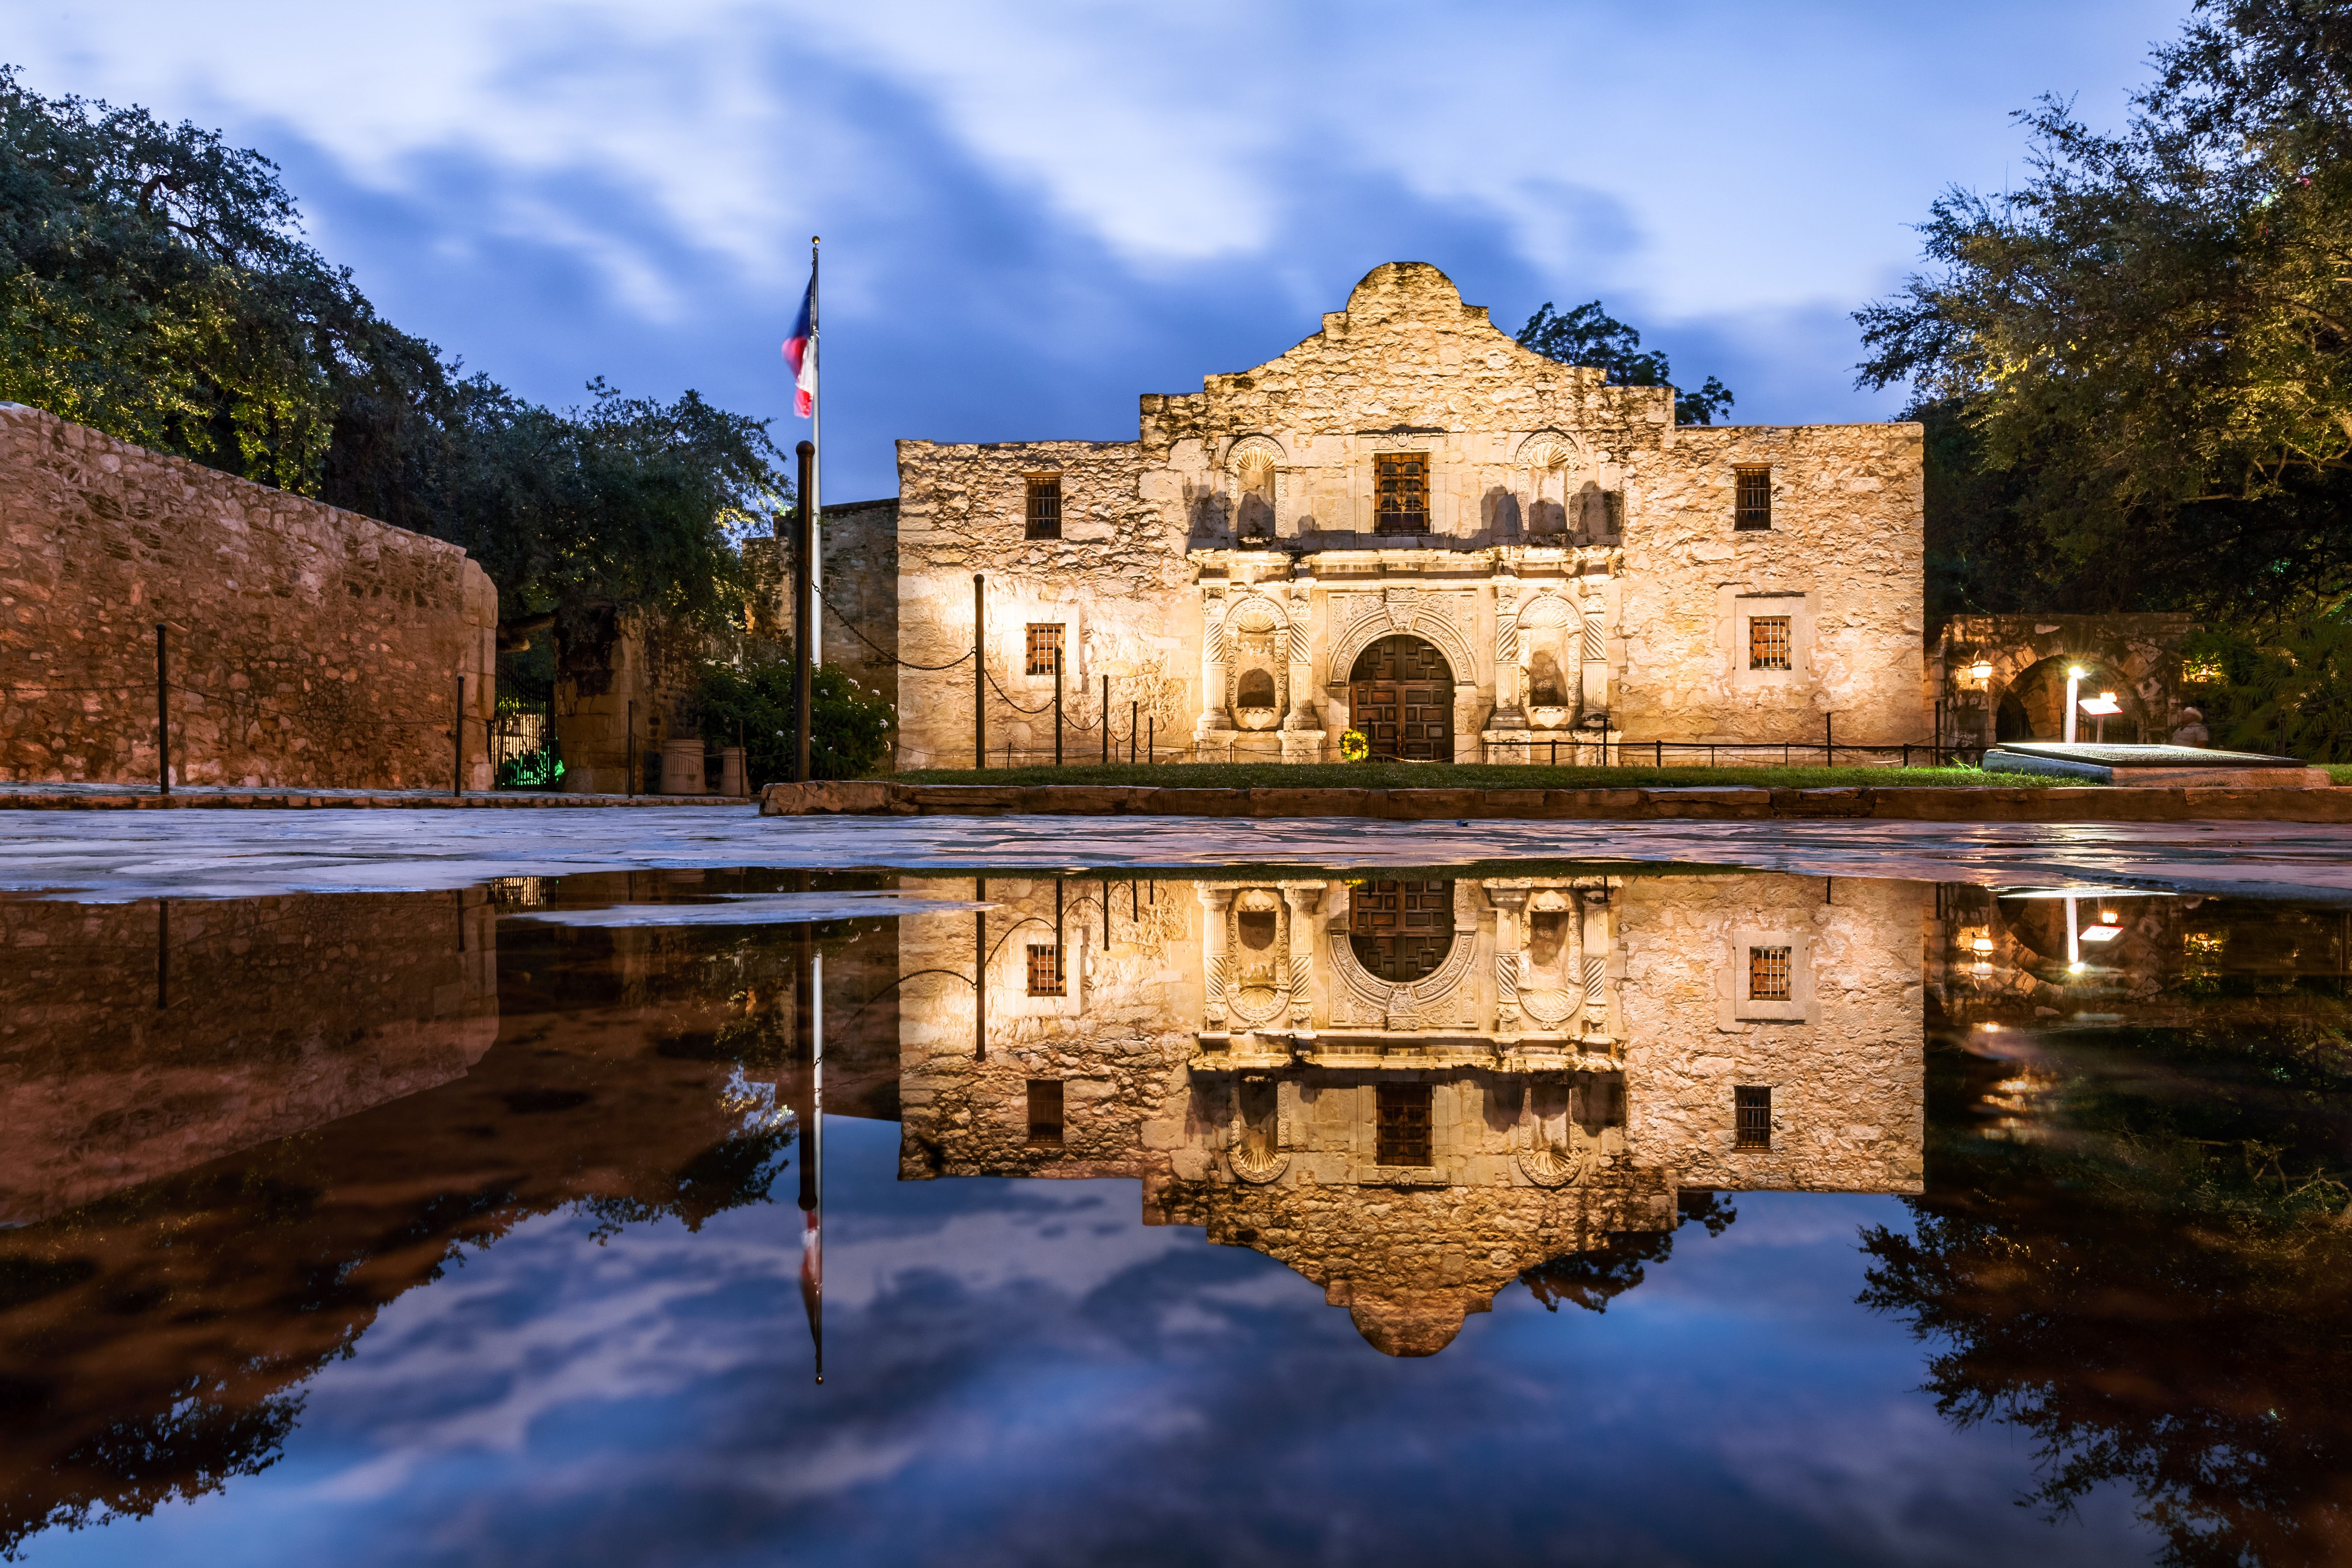 The Alamo at sunset after a rainfall